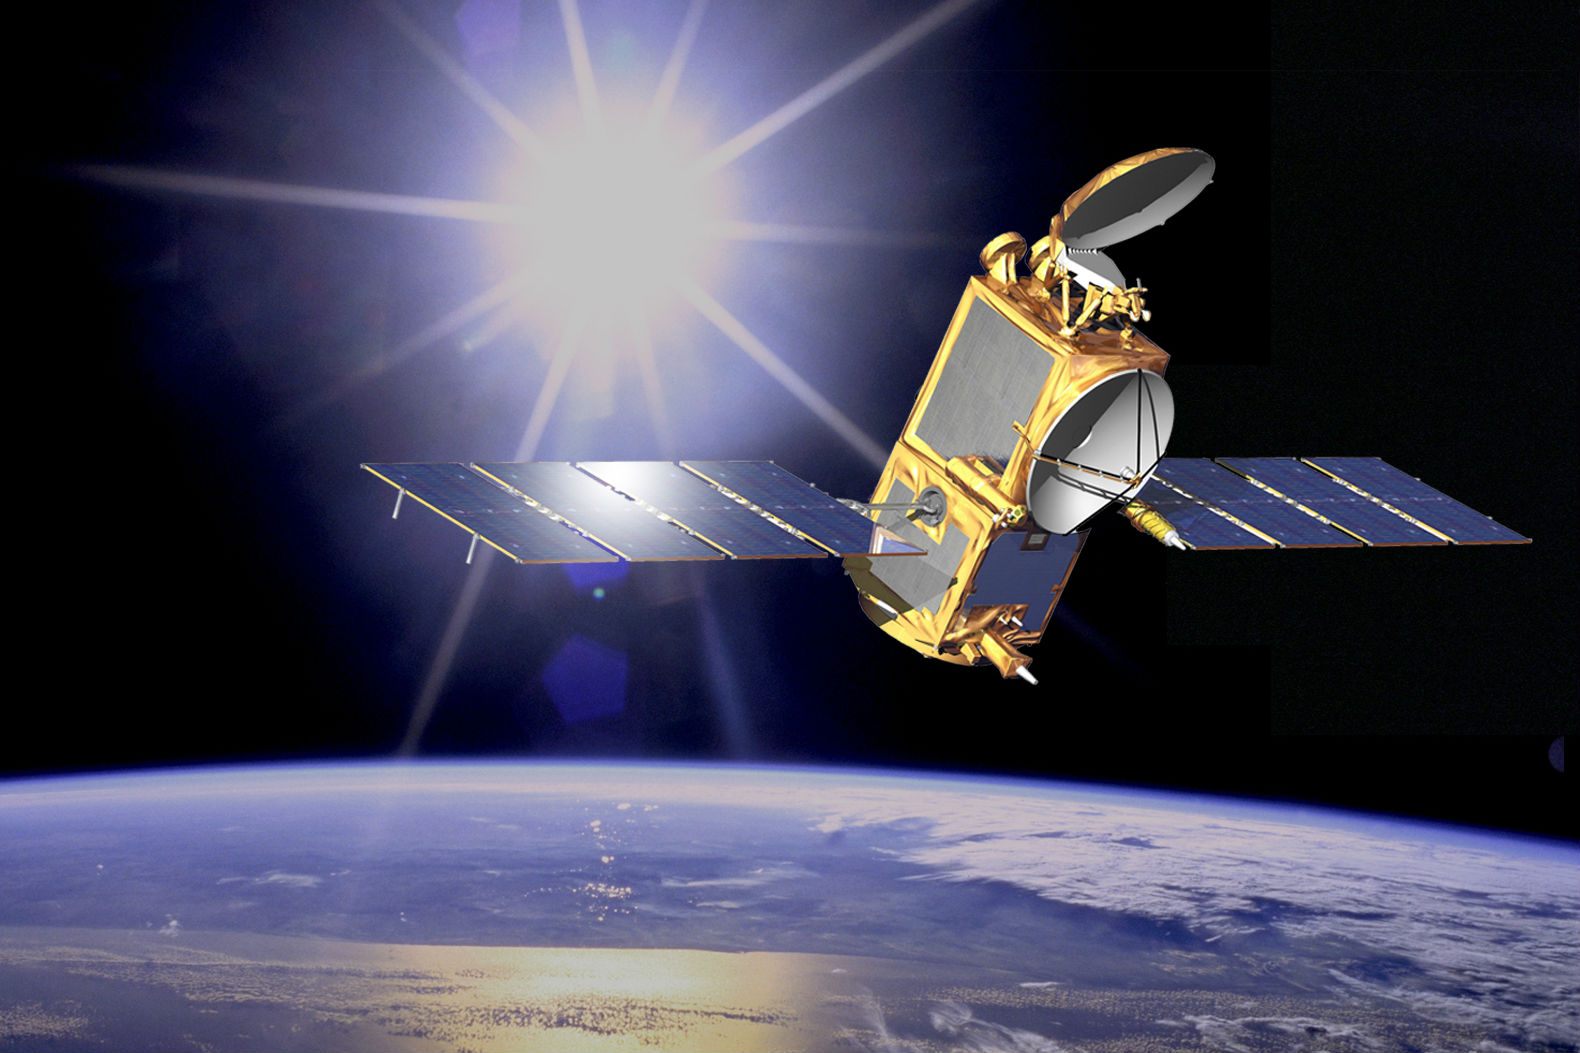 Satellites and Solar Flares Among Emerging Risks